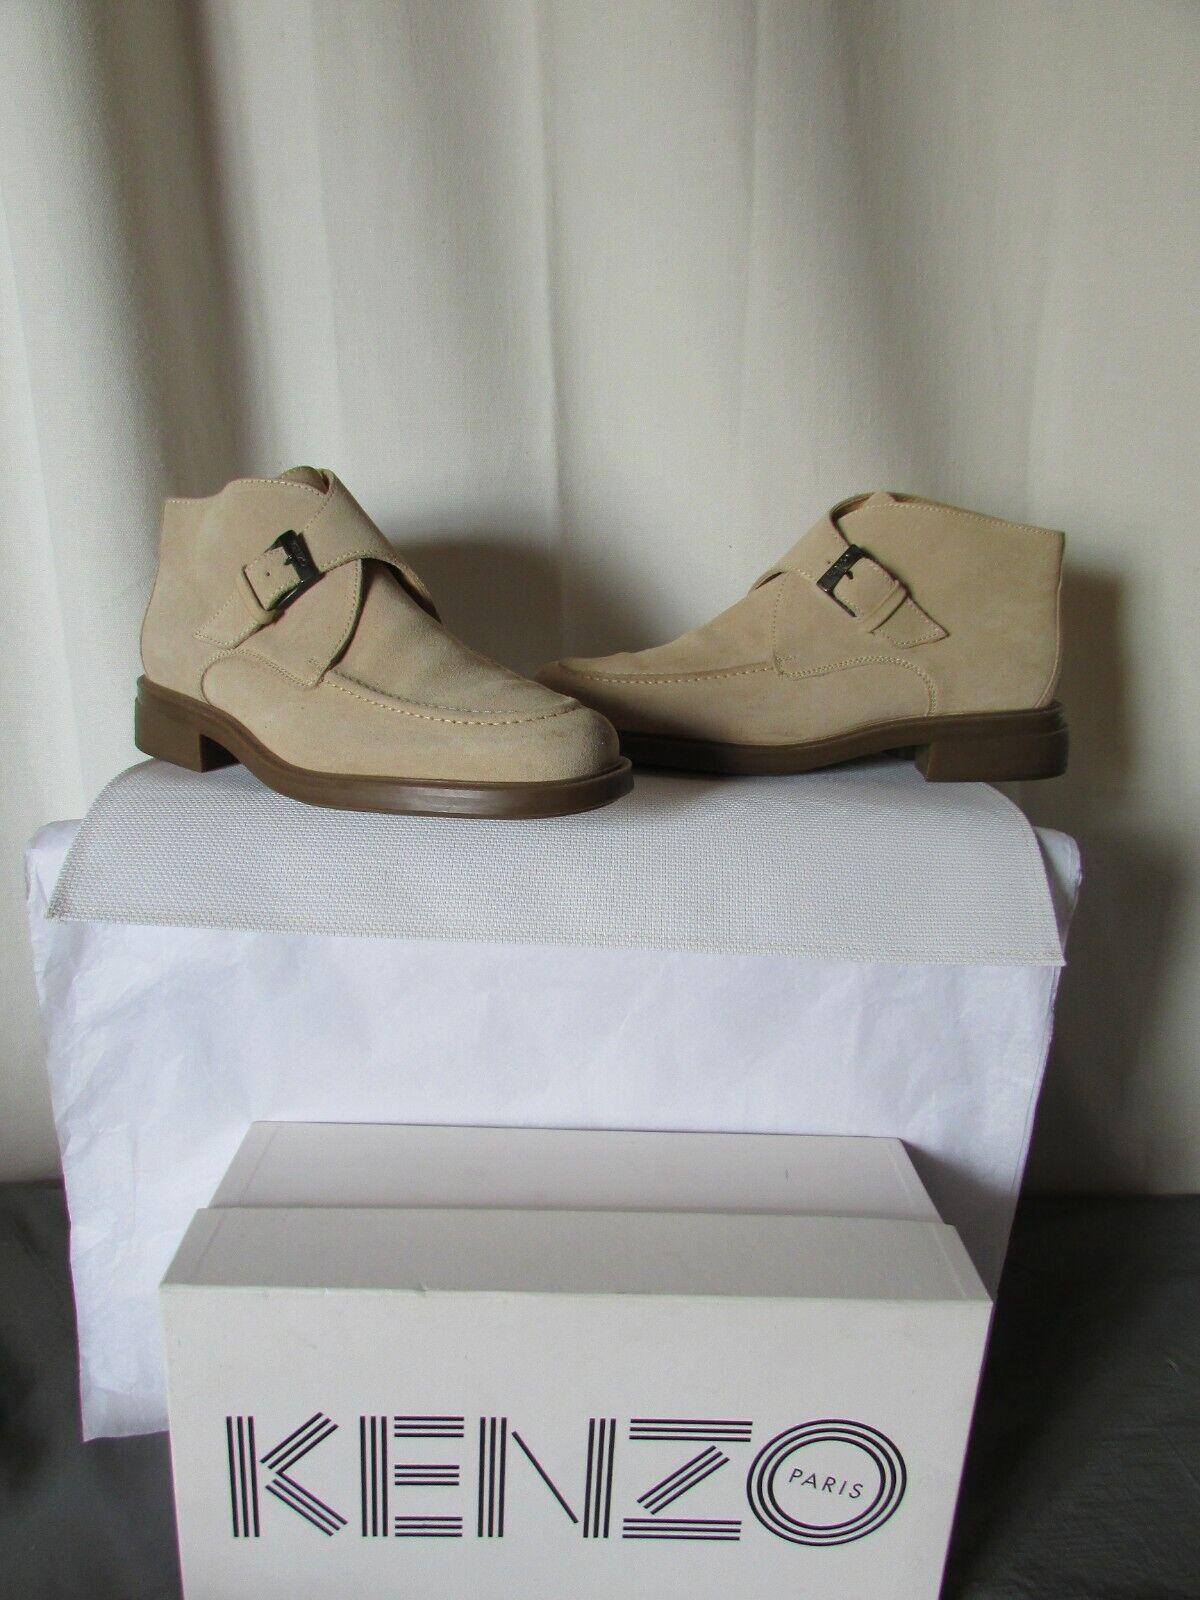 Kenzo Stiefletten Schuhe Nubuk 44 Beige 523afsqsn85394 Stiefel